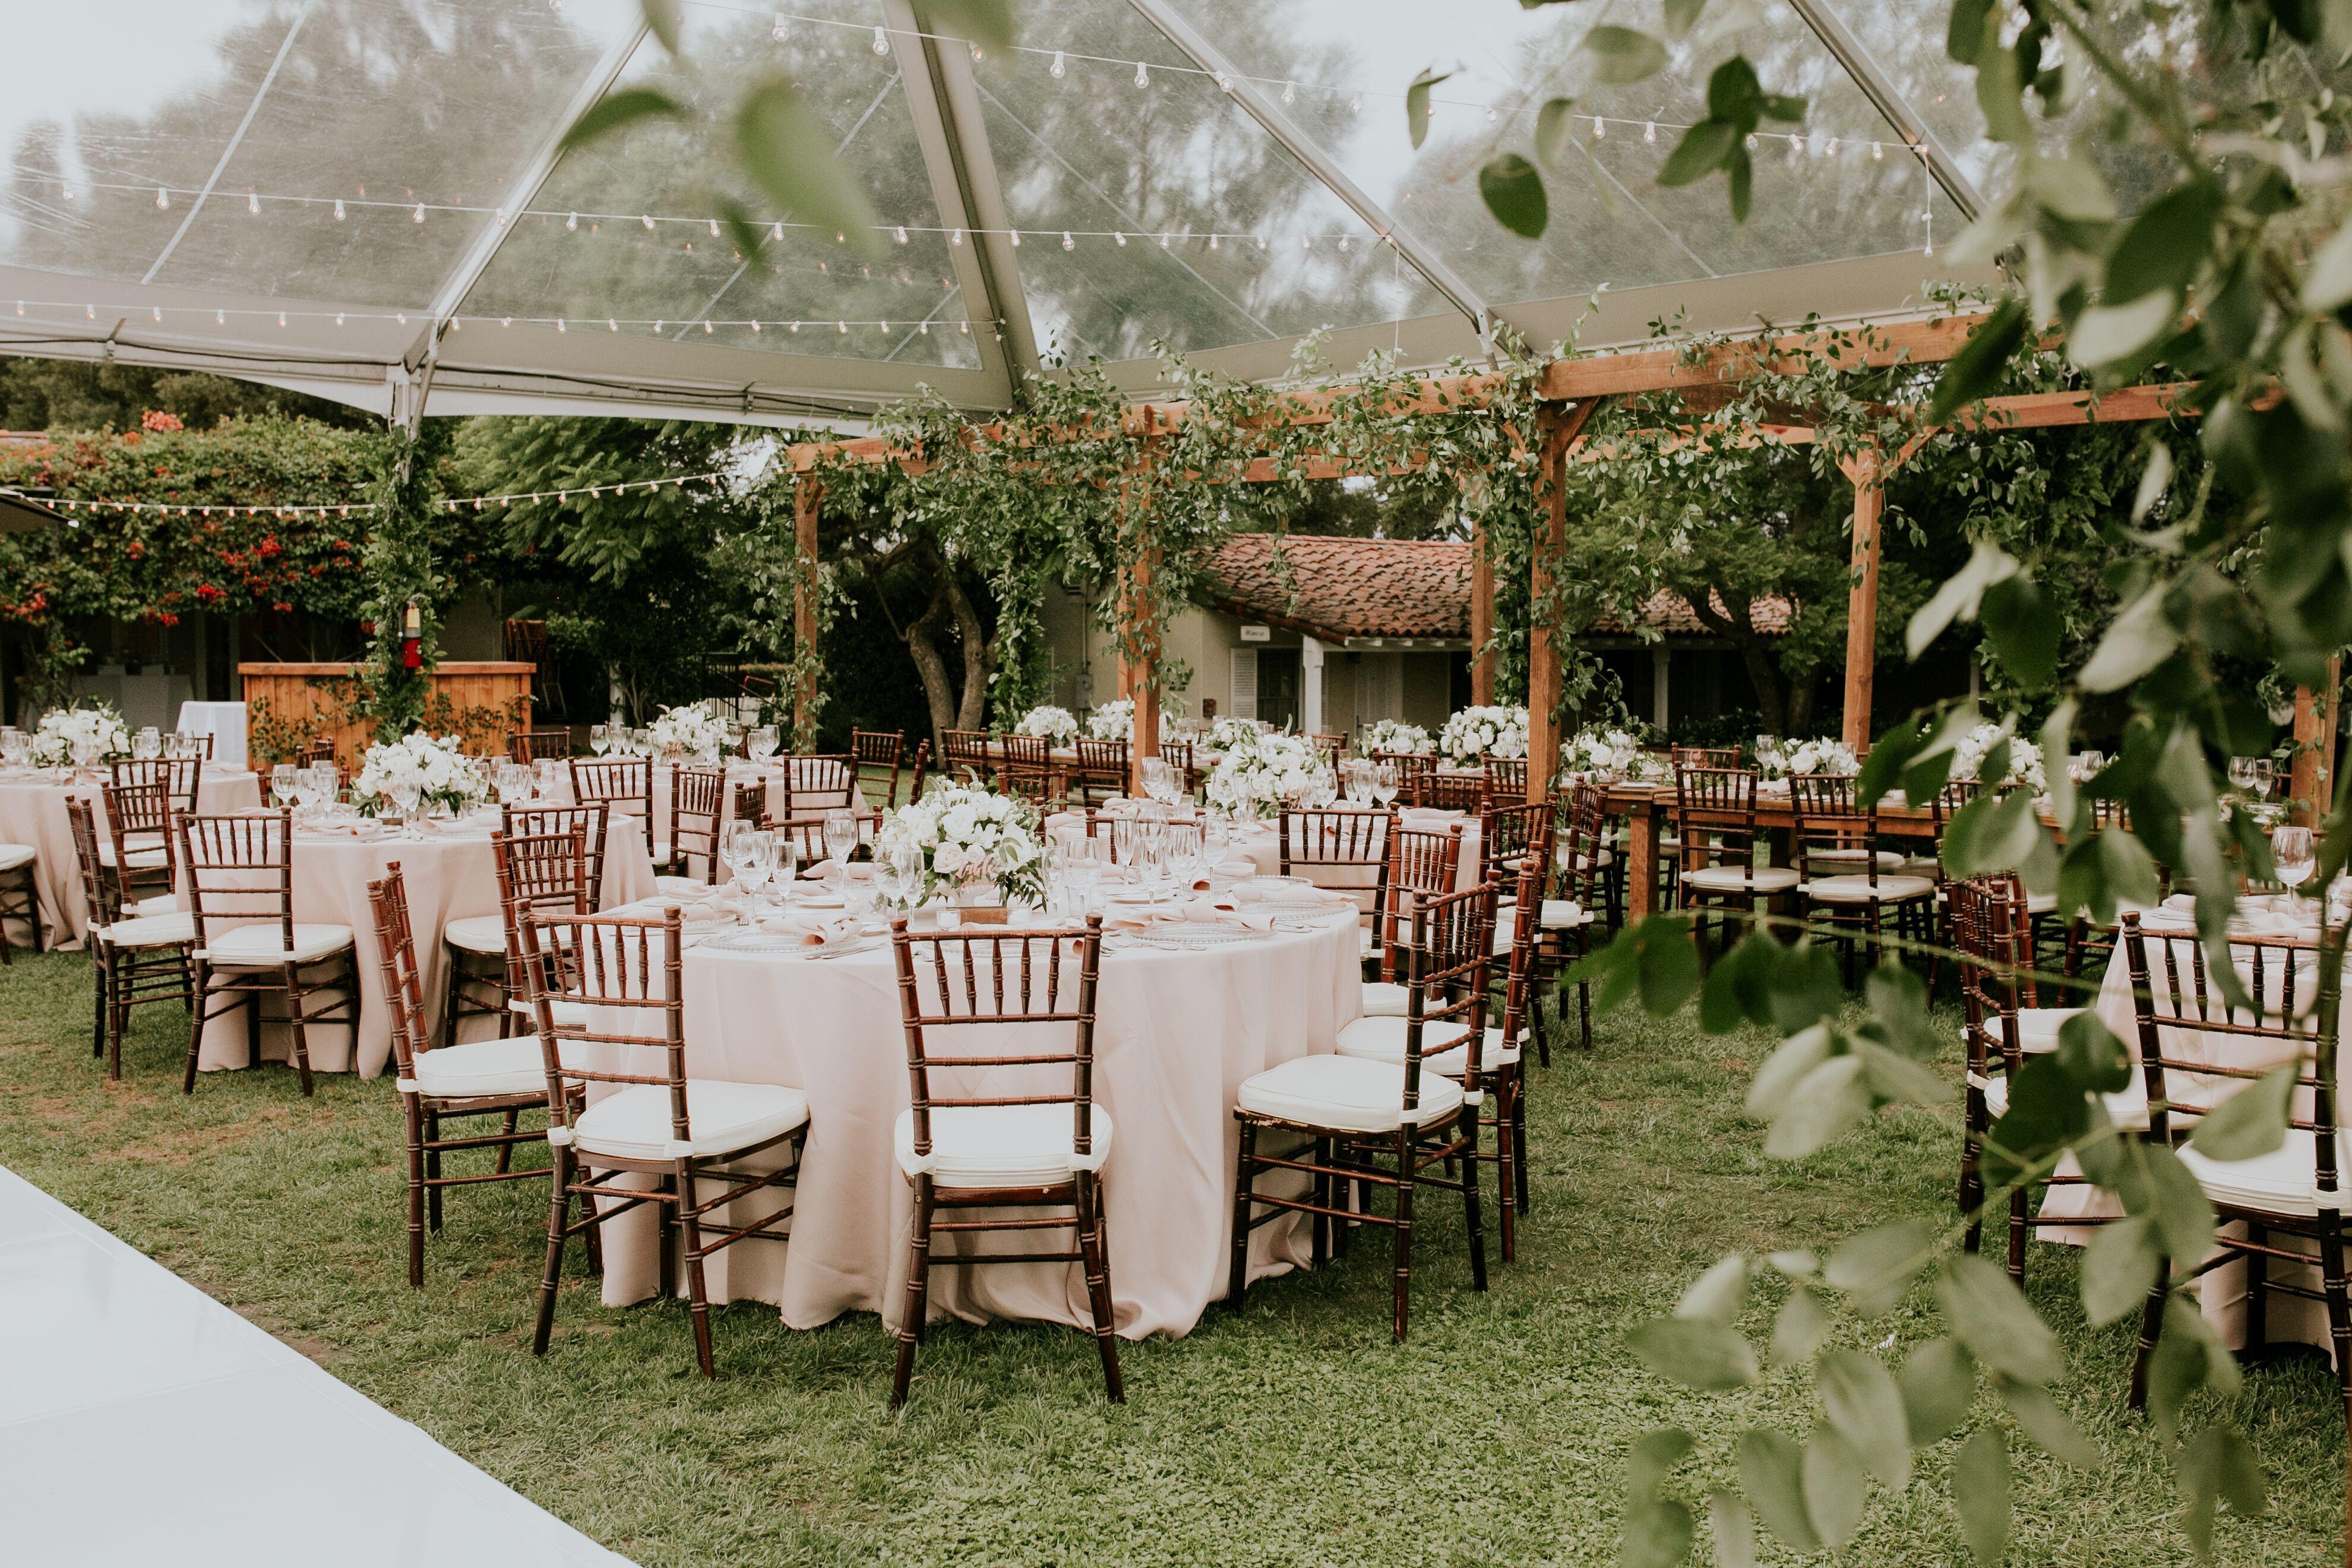 Jason Alexa S Wedding At The Inn At Rancho Santa Fe Wedding Southern California San Diego Botanic Garden Rustic Table Decor